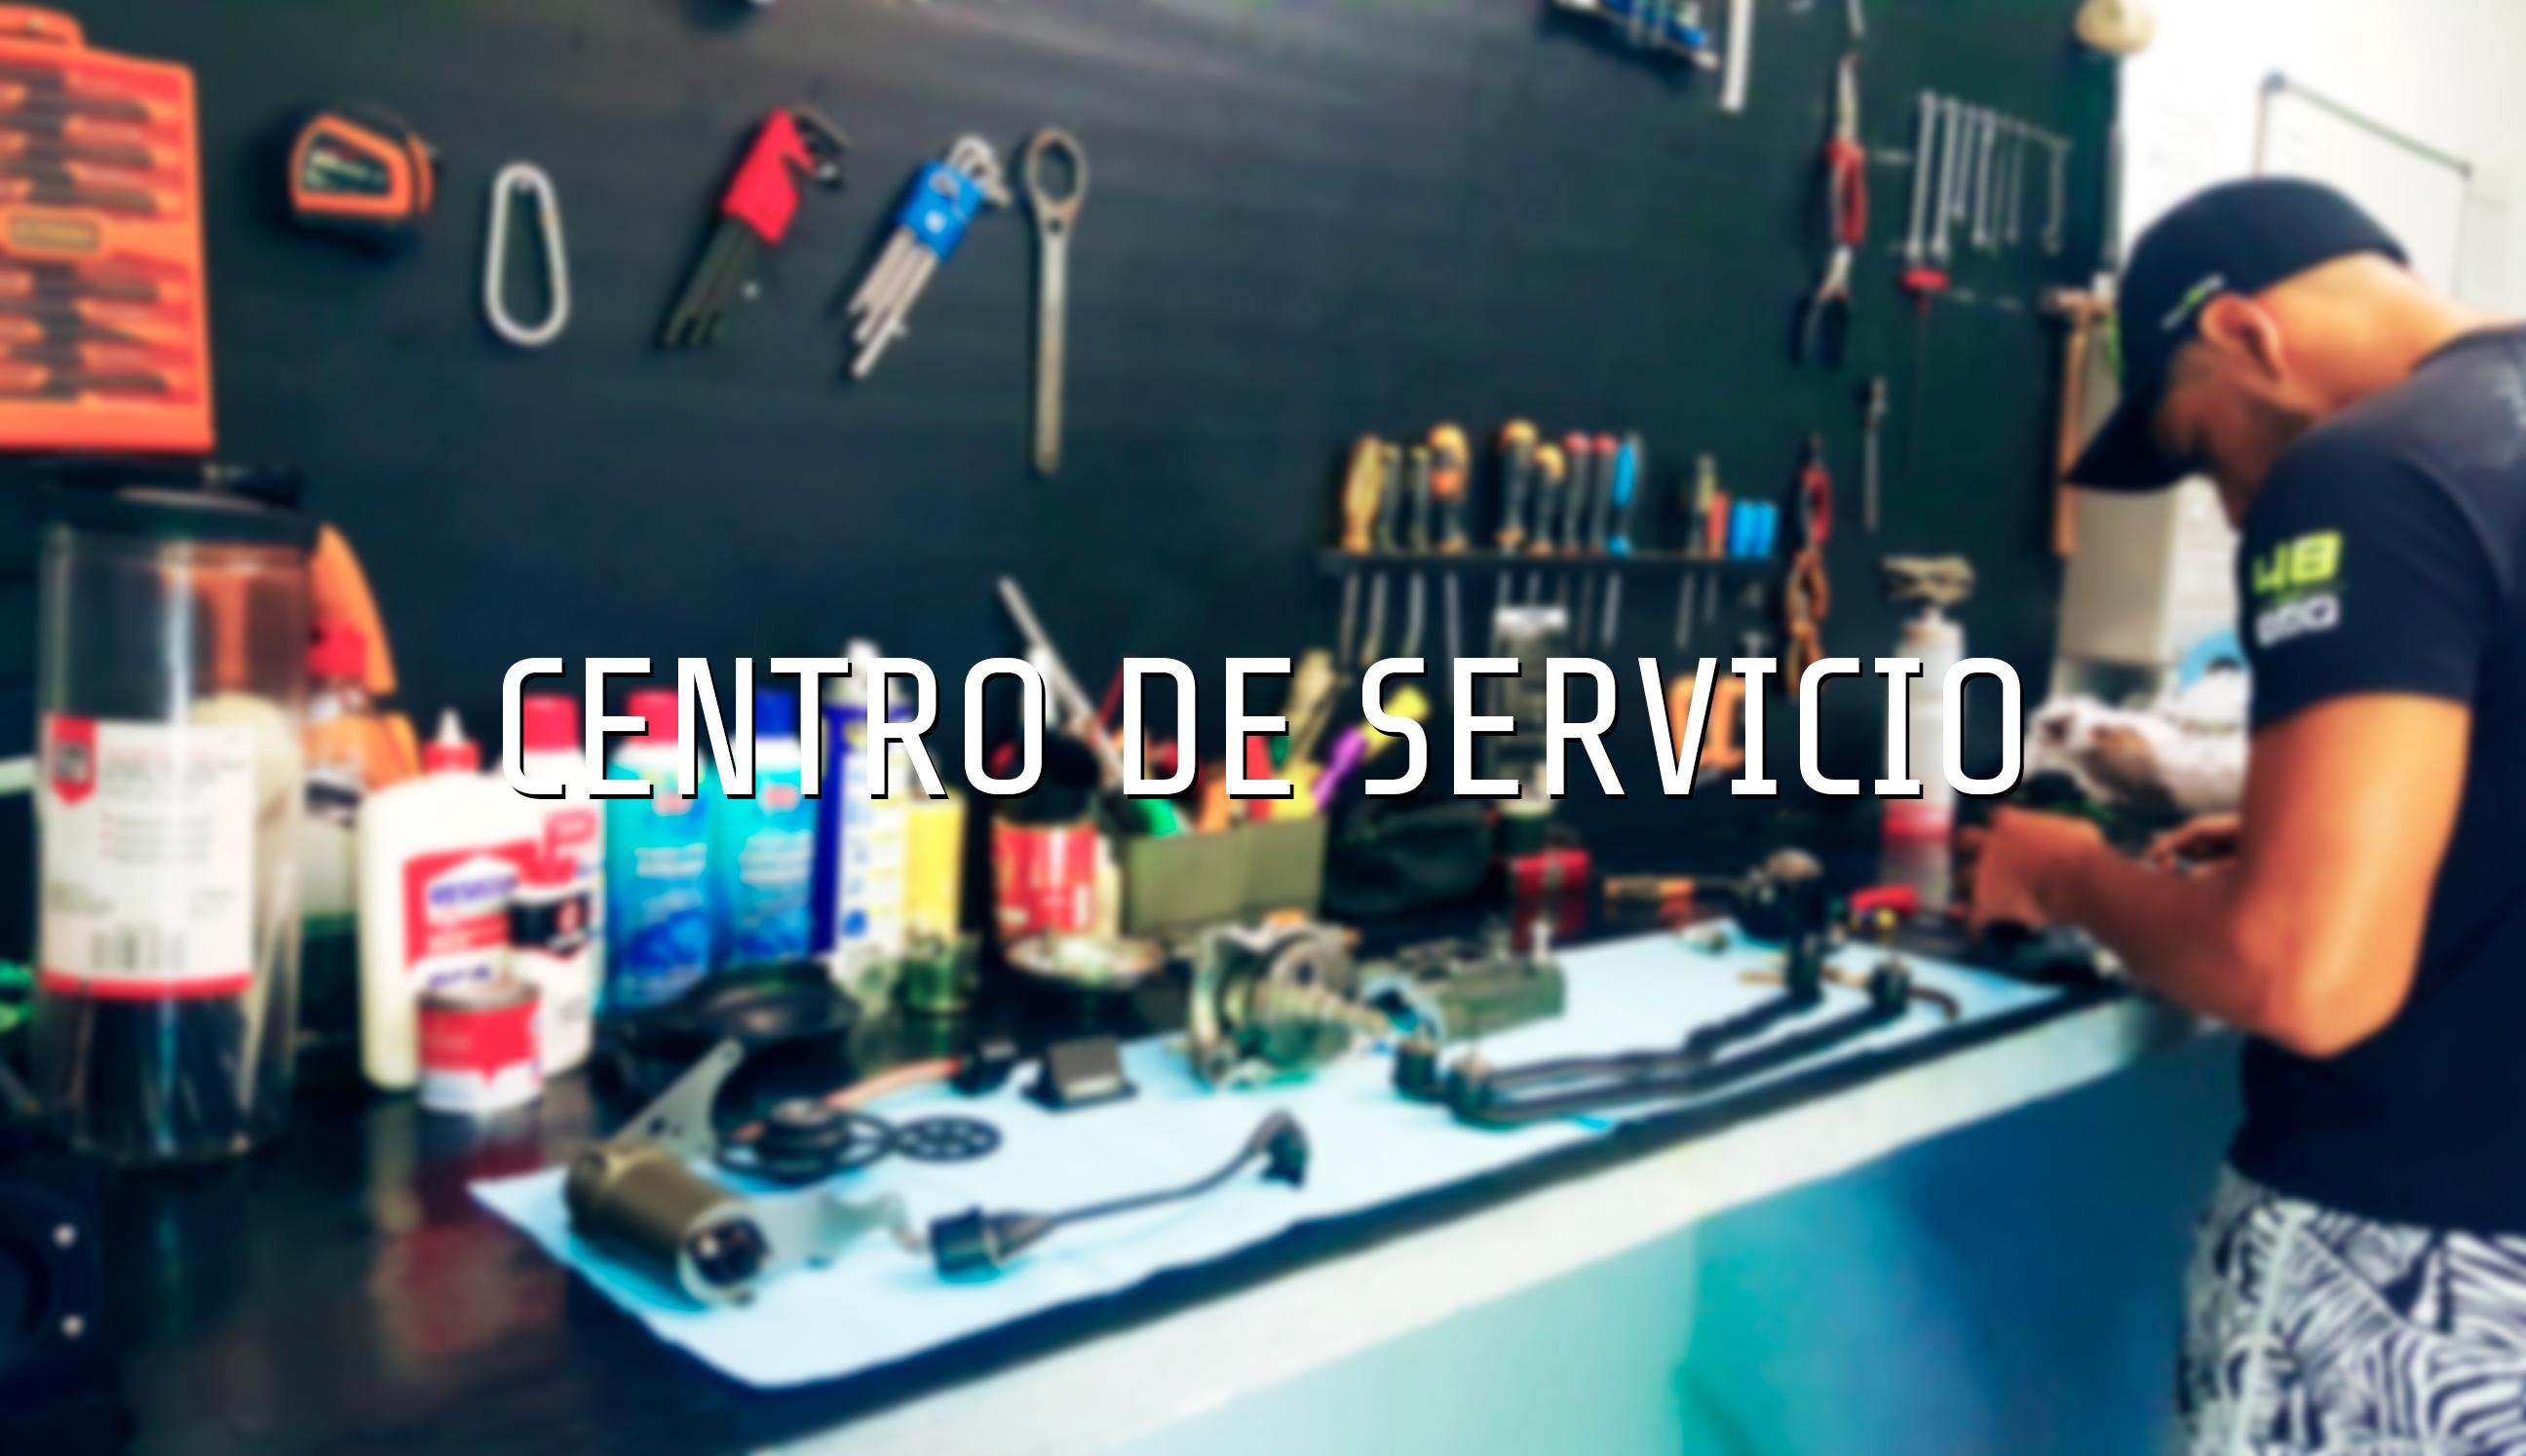 centro de servicio titulo